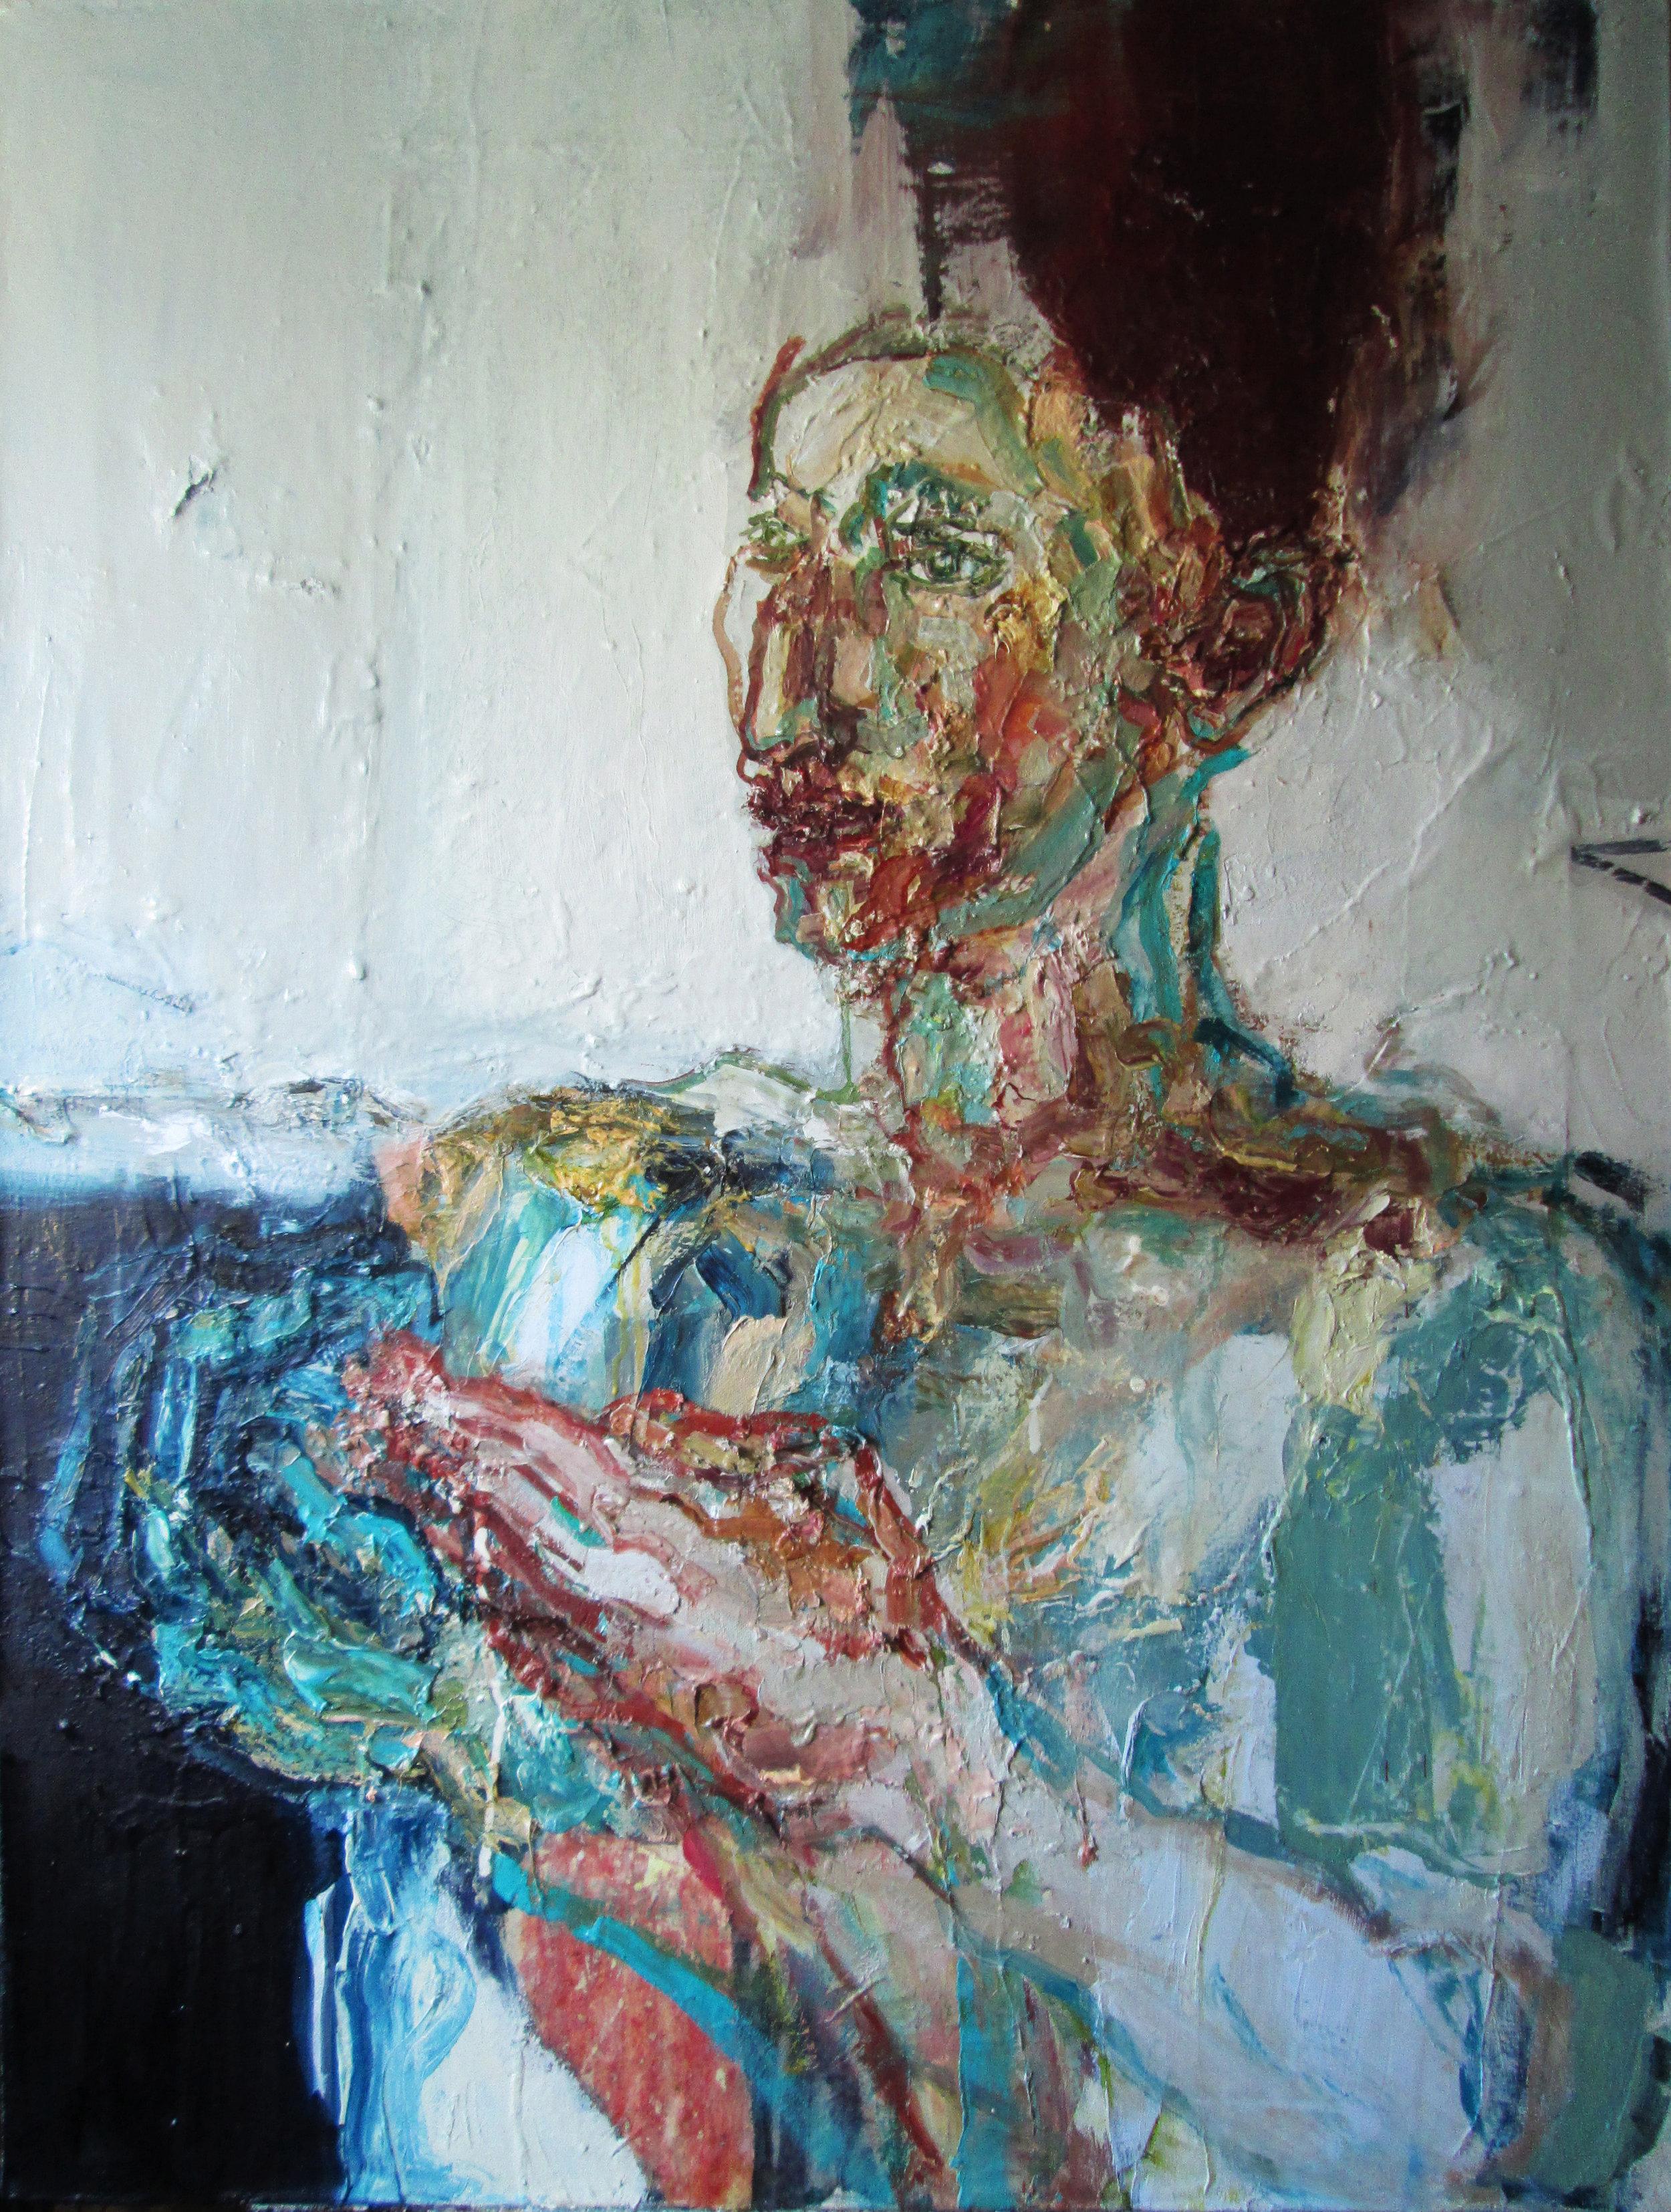 Title: Peridotite Crystal  Size: 103 x 82 cm  Medium: Oil on canvas  Price:  SOLD